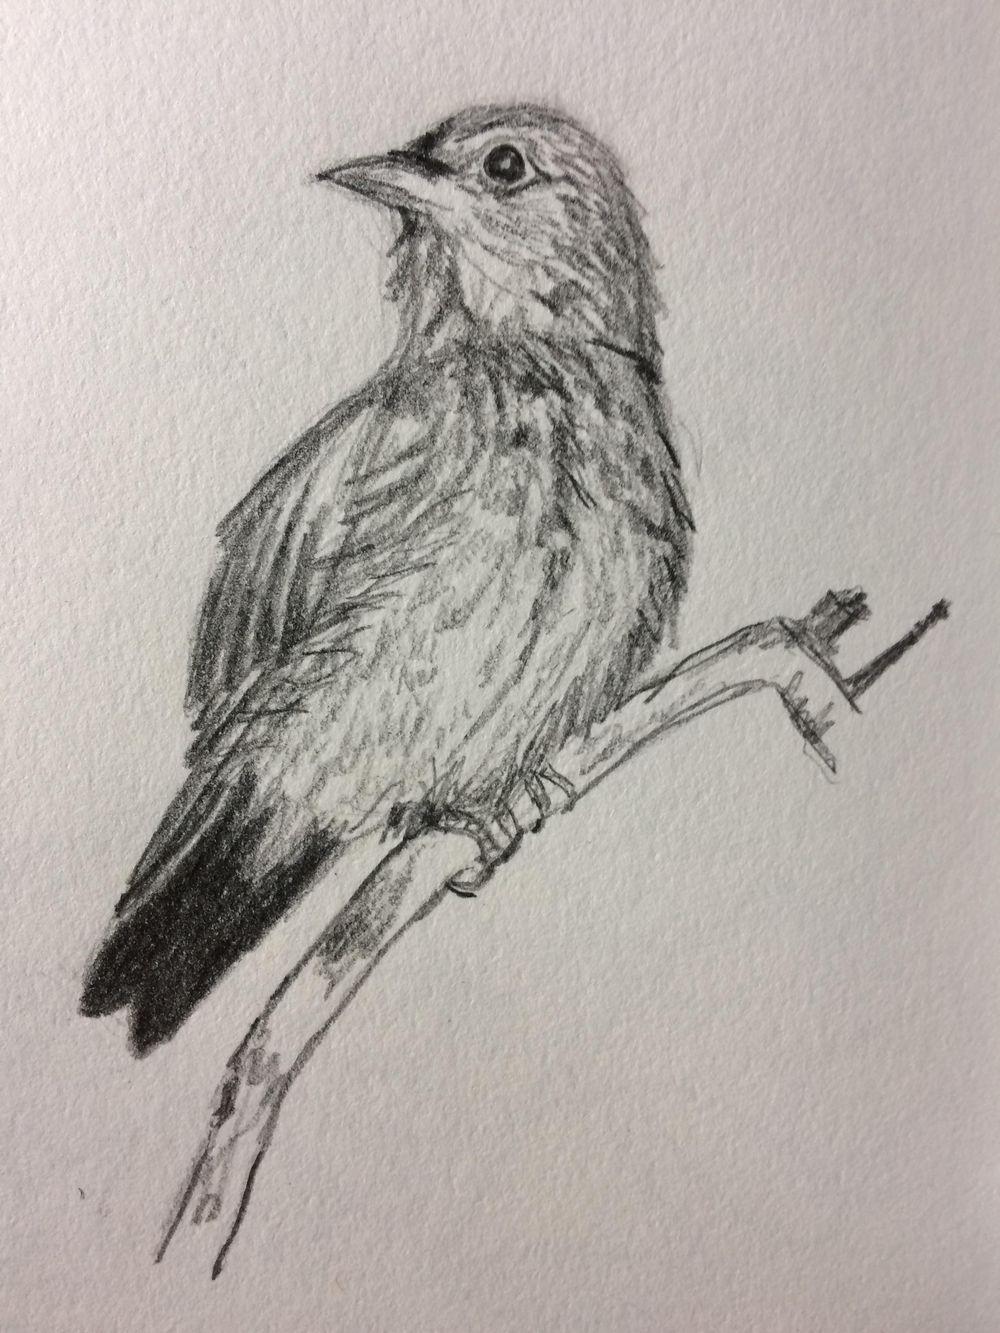 Bluebird - image 2 - student project